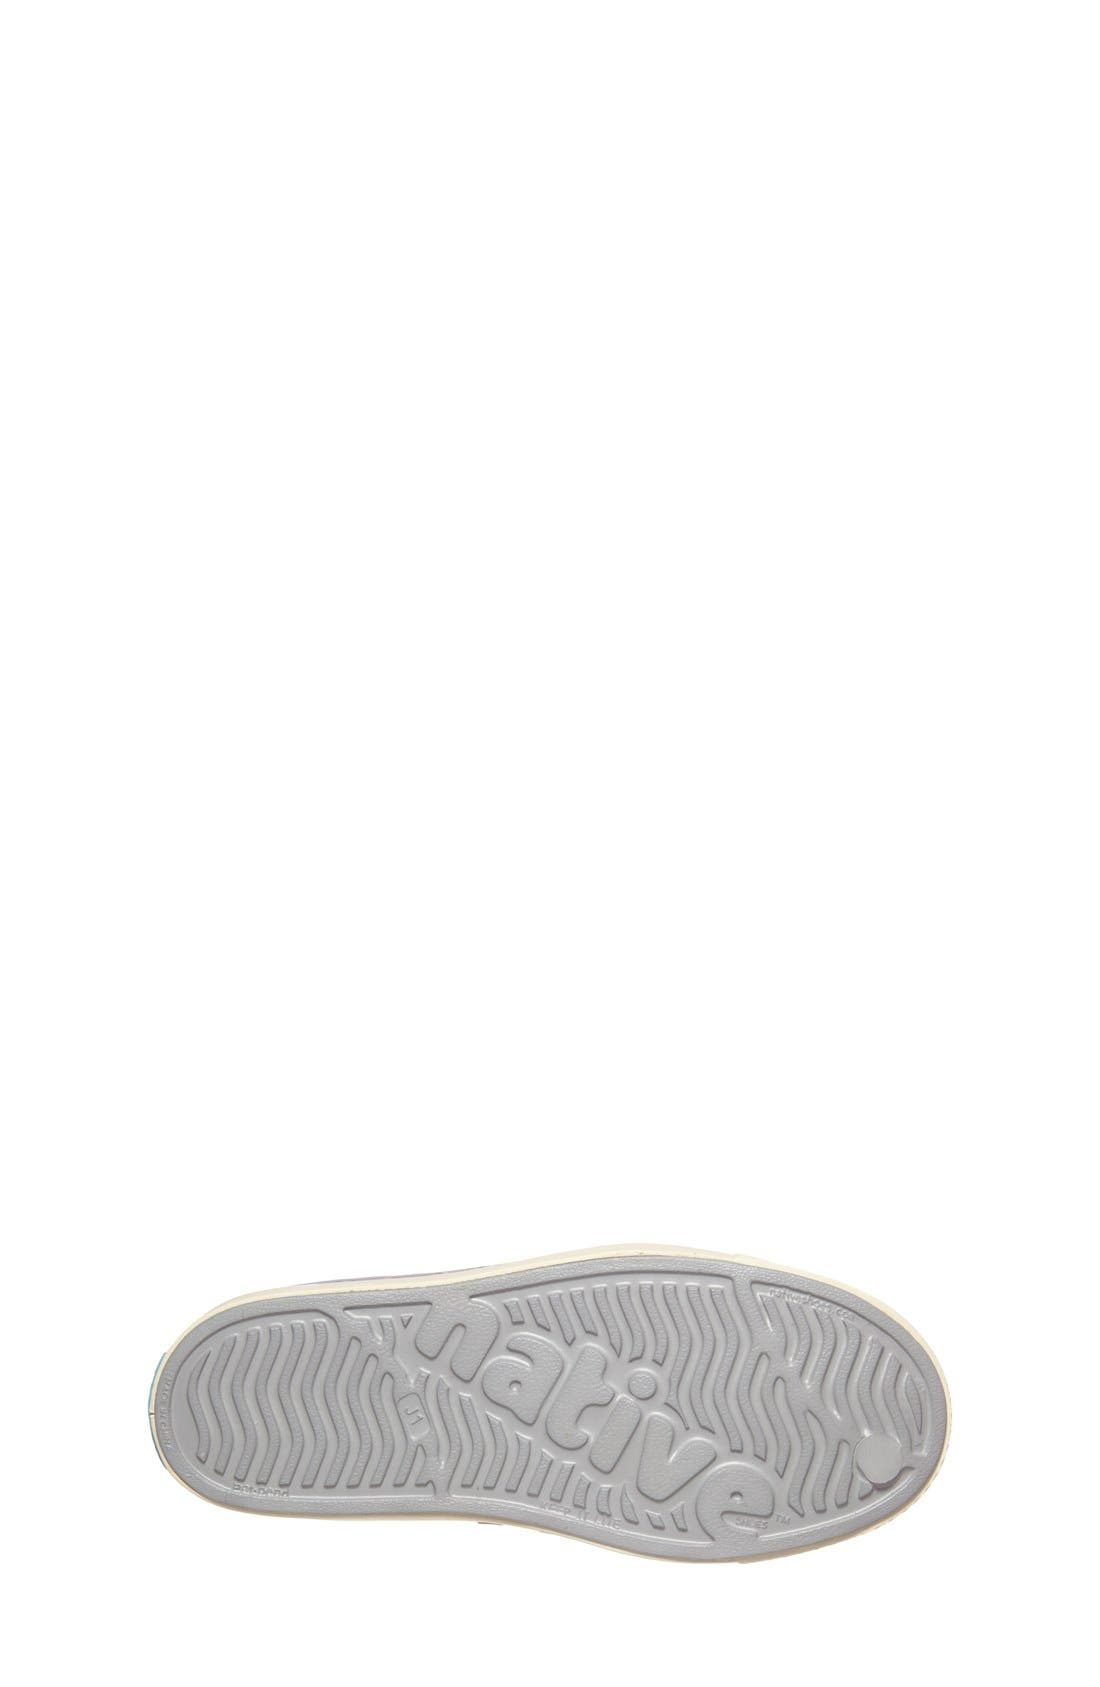 'Jefferson' Water Friendly Slip-On Sneaker,                             Alternate thumbnail 192, color,